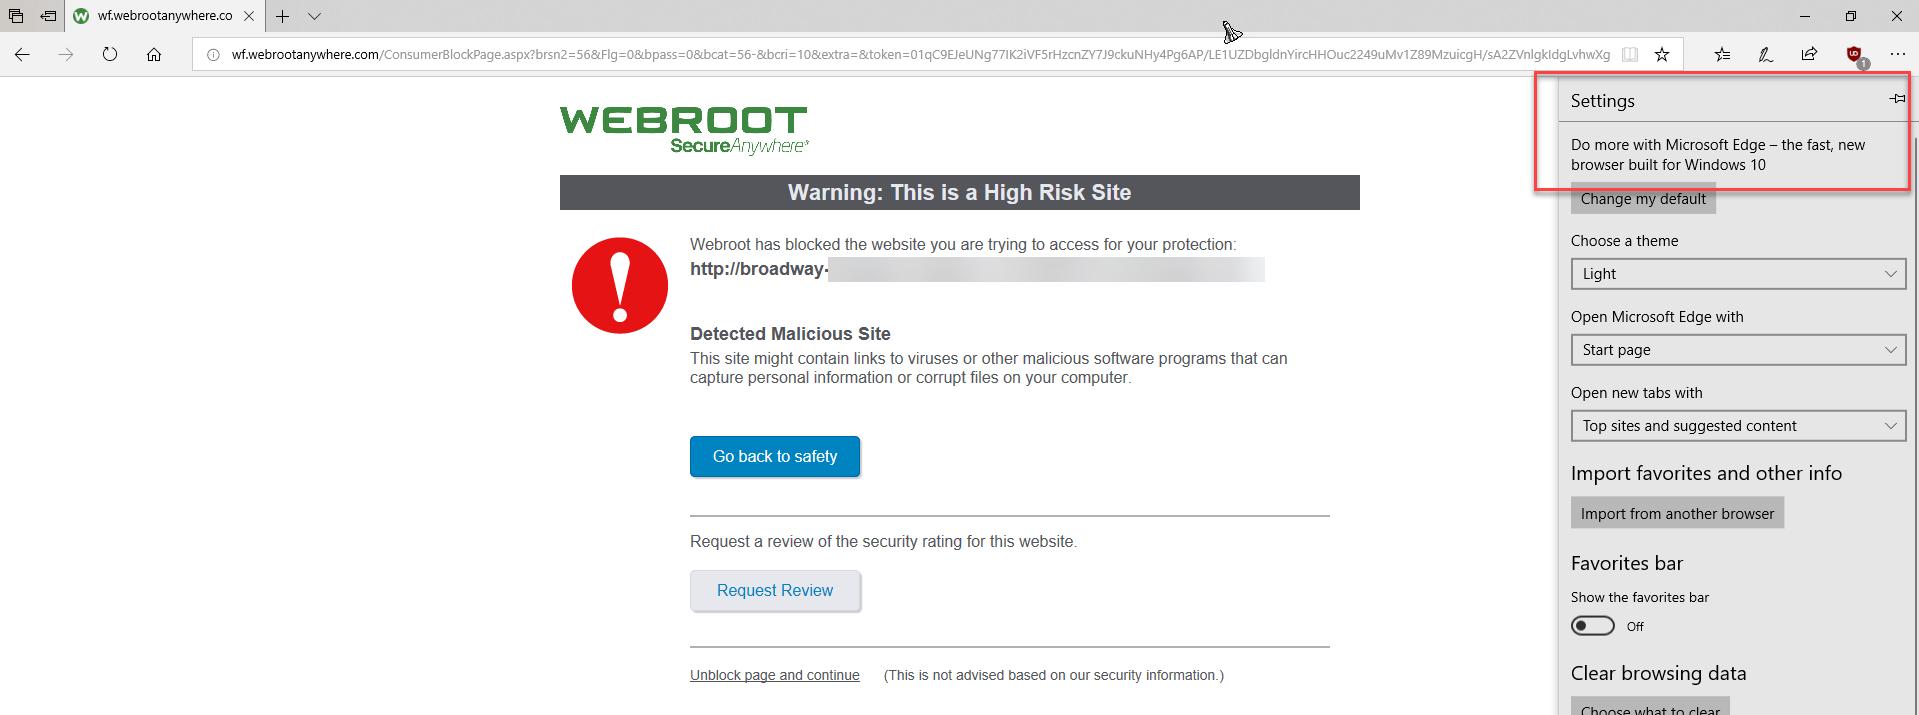 Microsoft Edge for Windows 10 | Webroot Community